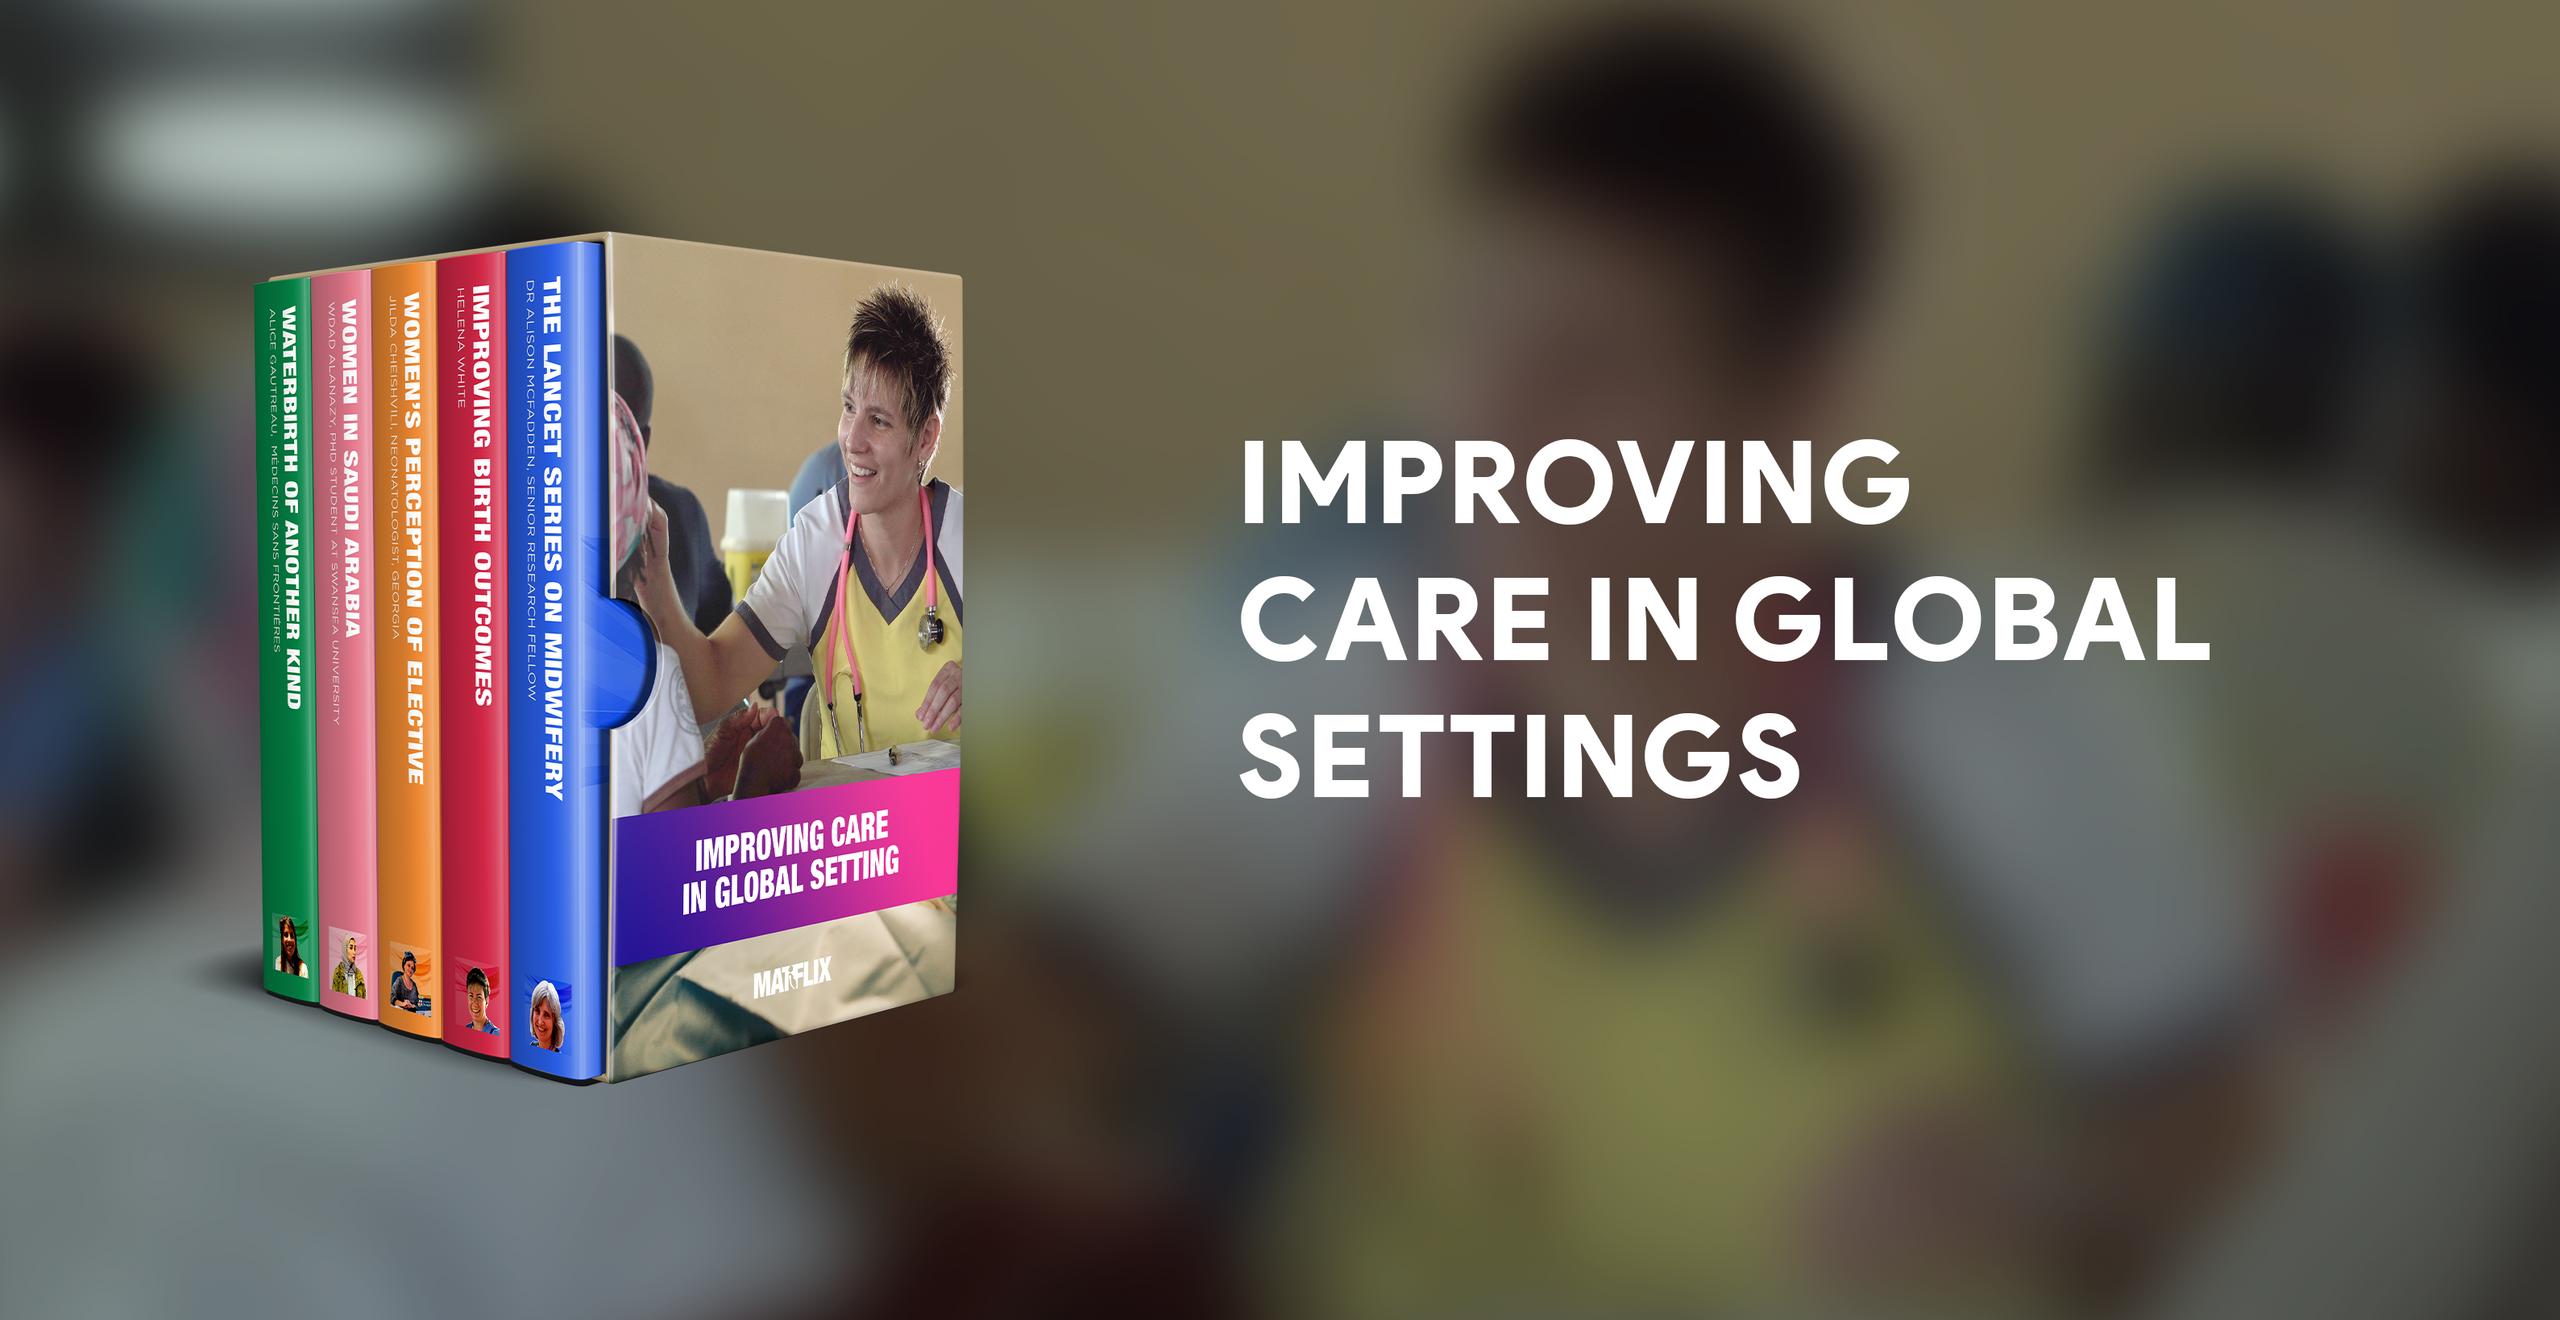 IMPROVING CARE IN GLOBAL SETTINGS